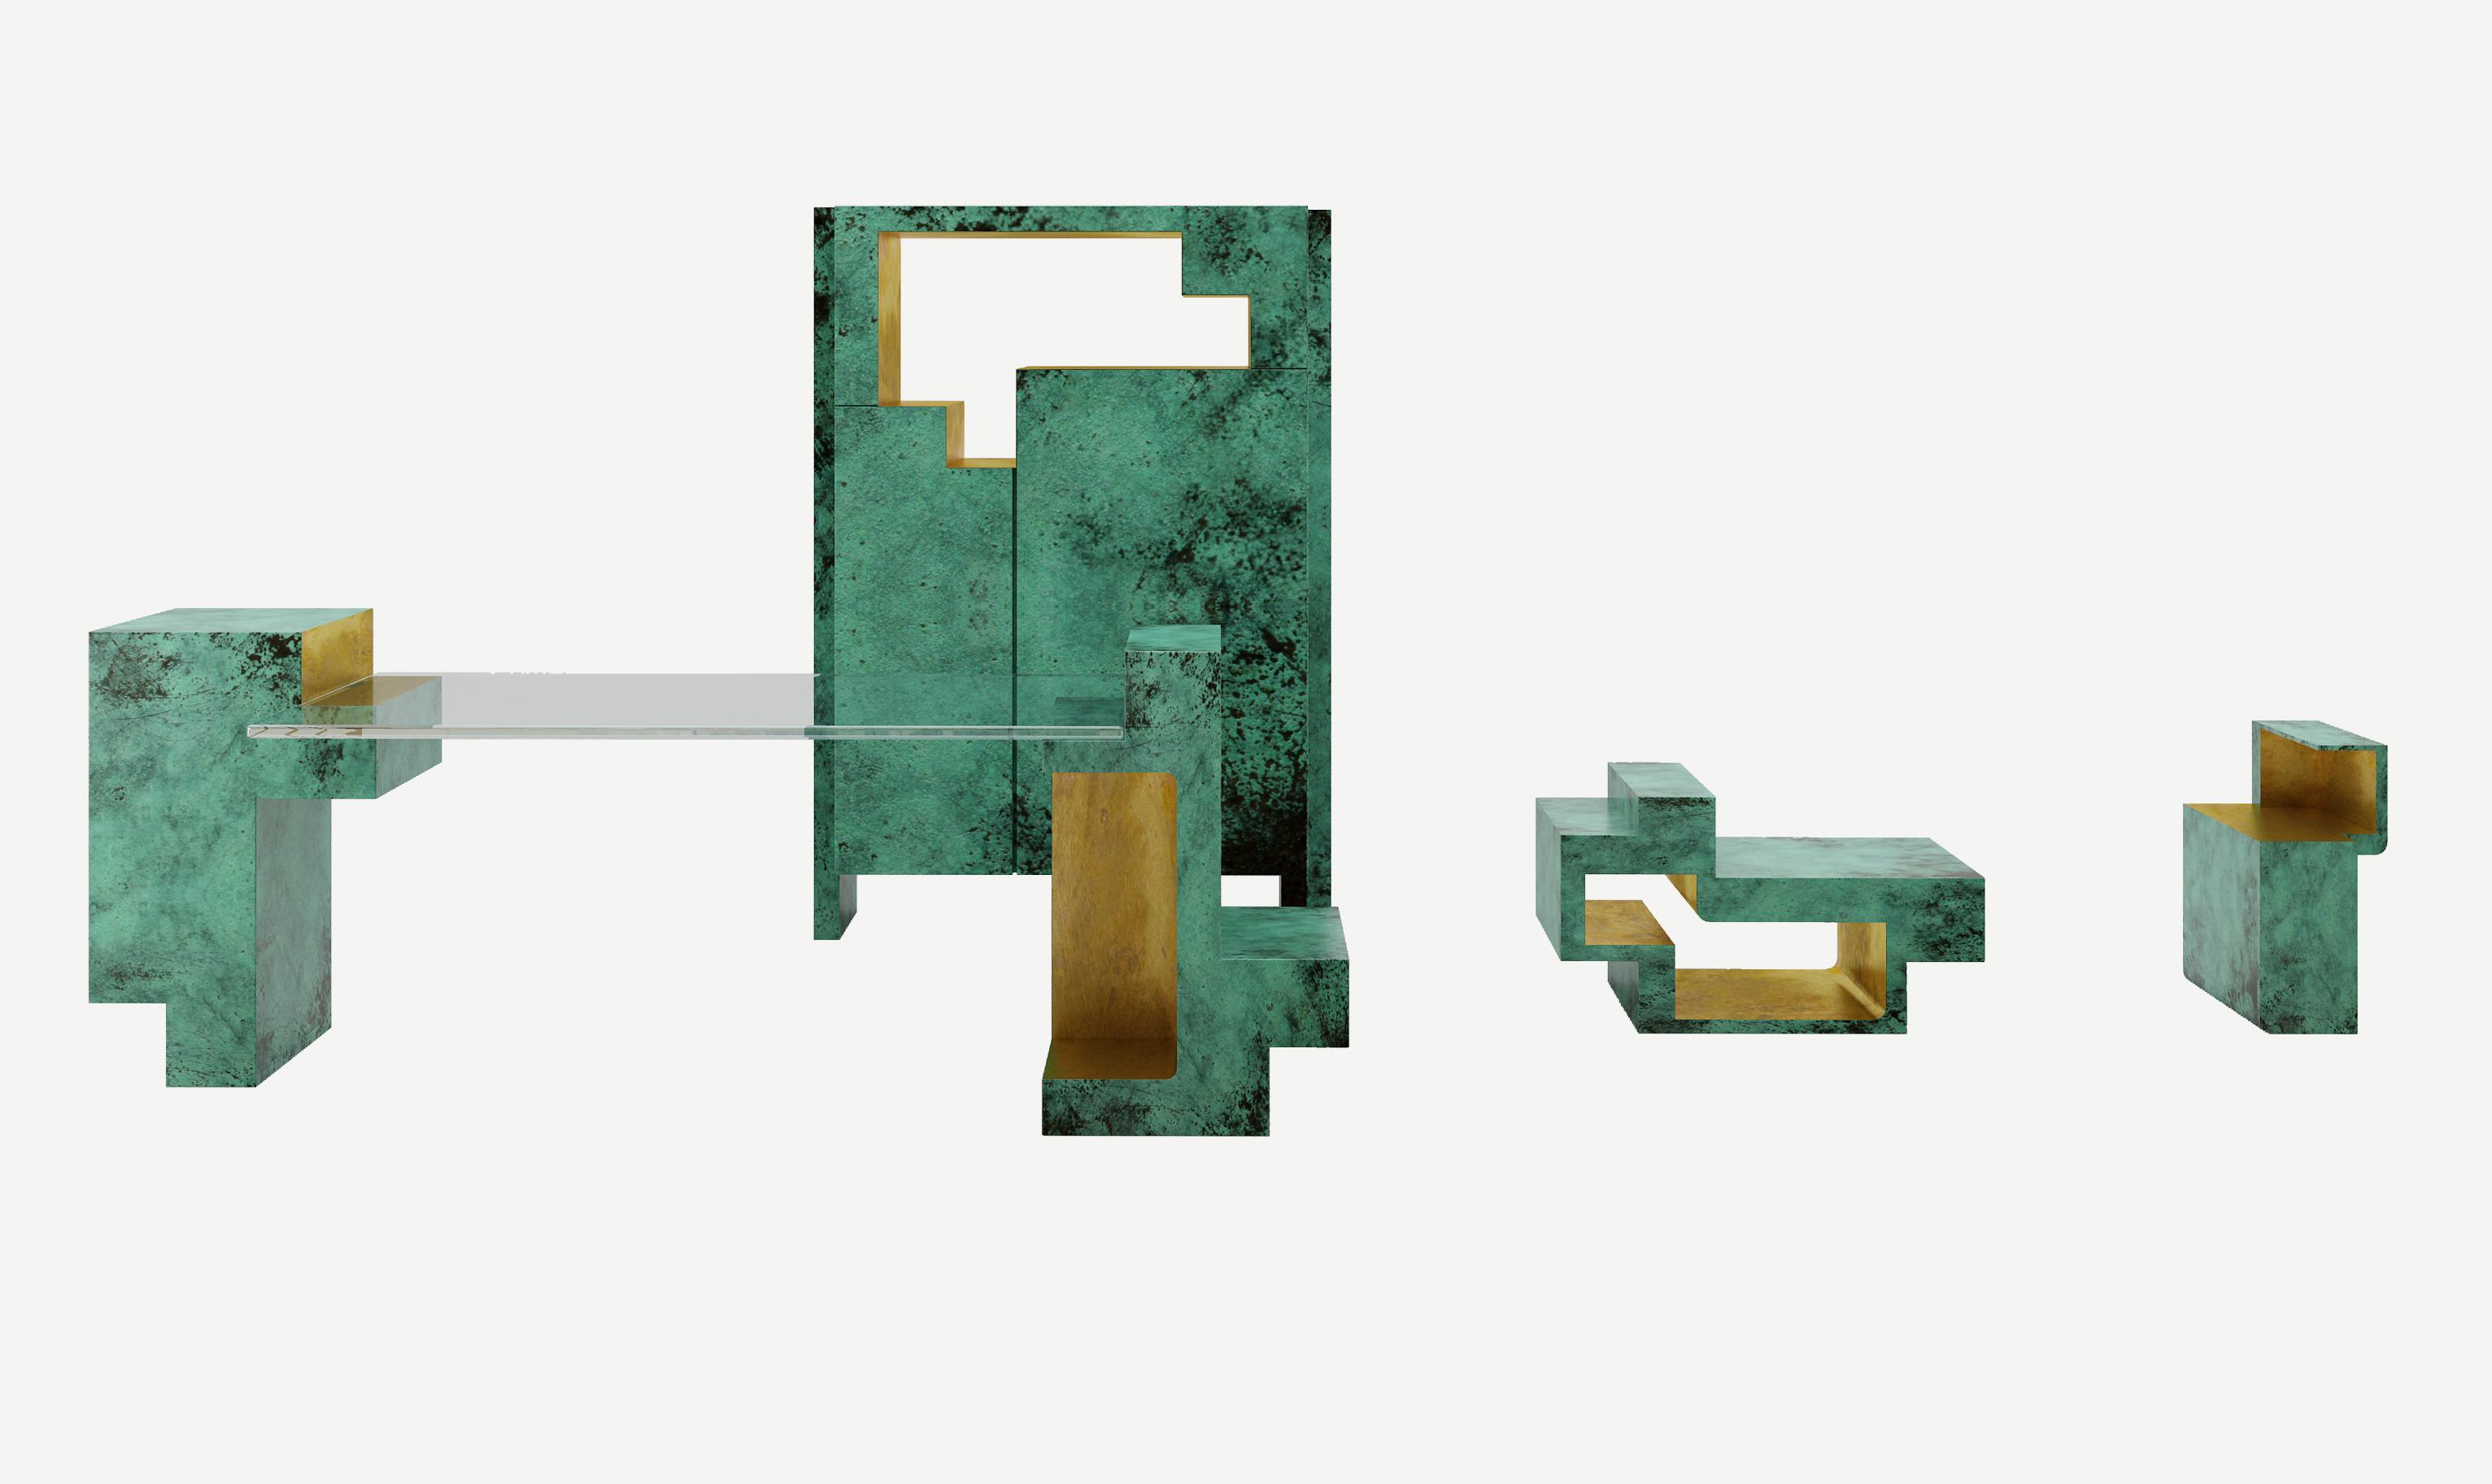 DesignMVW_XuMing&VirginieMoriette_NothingIsEverything_1_collectiblesHall